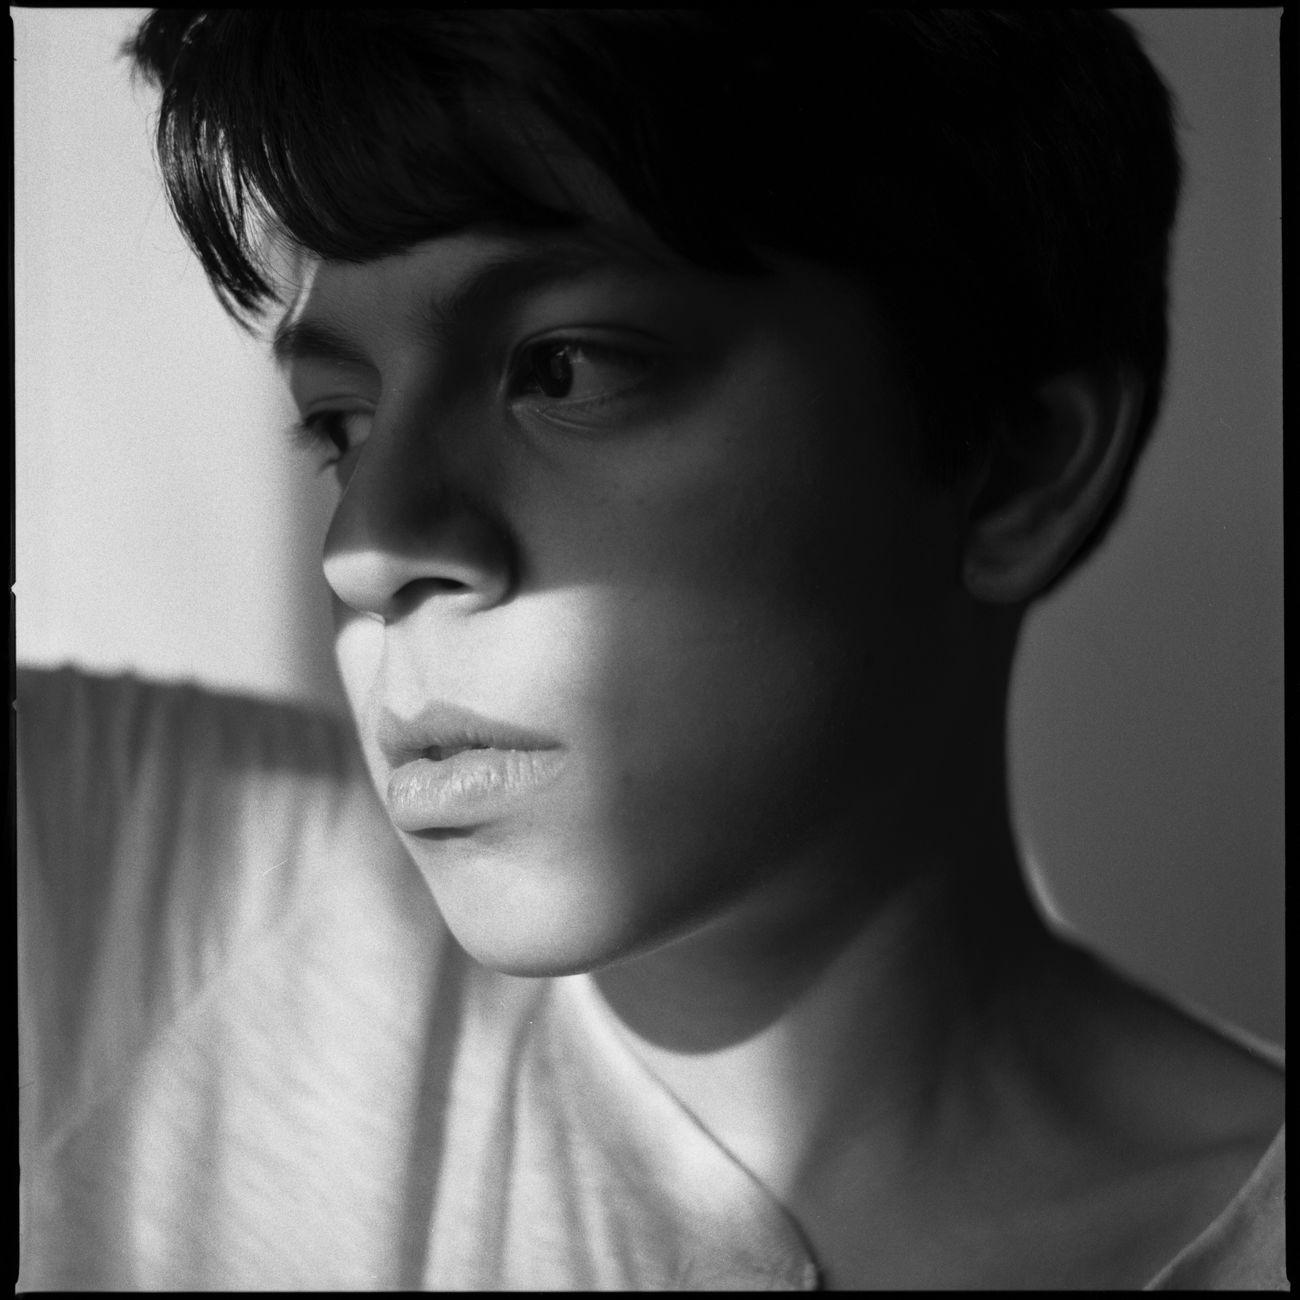 The Portraitist - 2017 EyeEm Awards Analogue Photography Hasselblad 500C/M Film